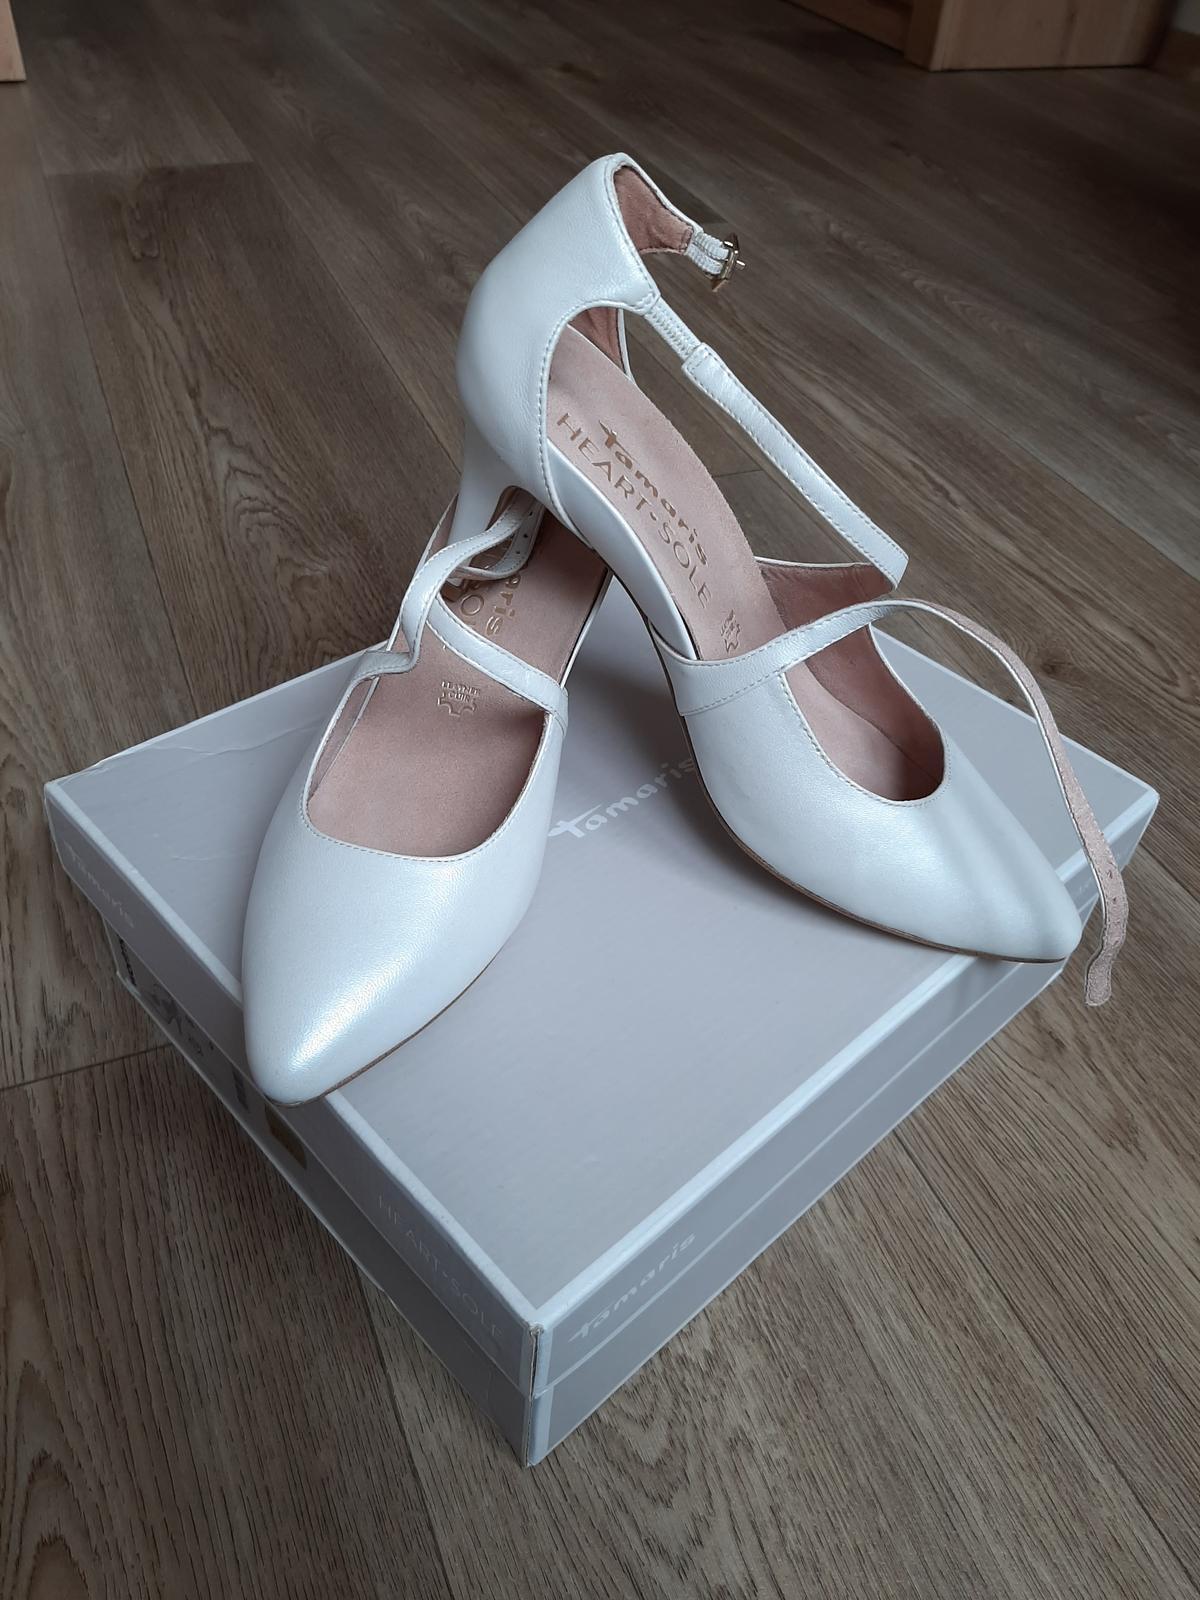 Svatební boty Tamaris, vel. 40 - Obrázek č. 1